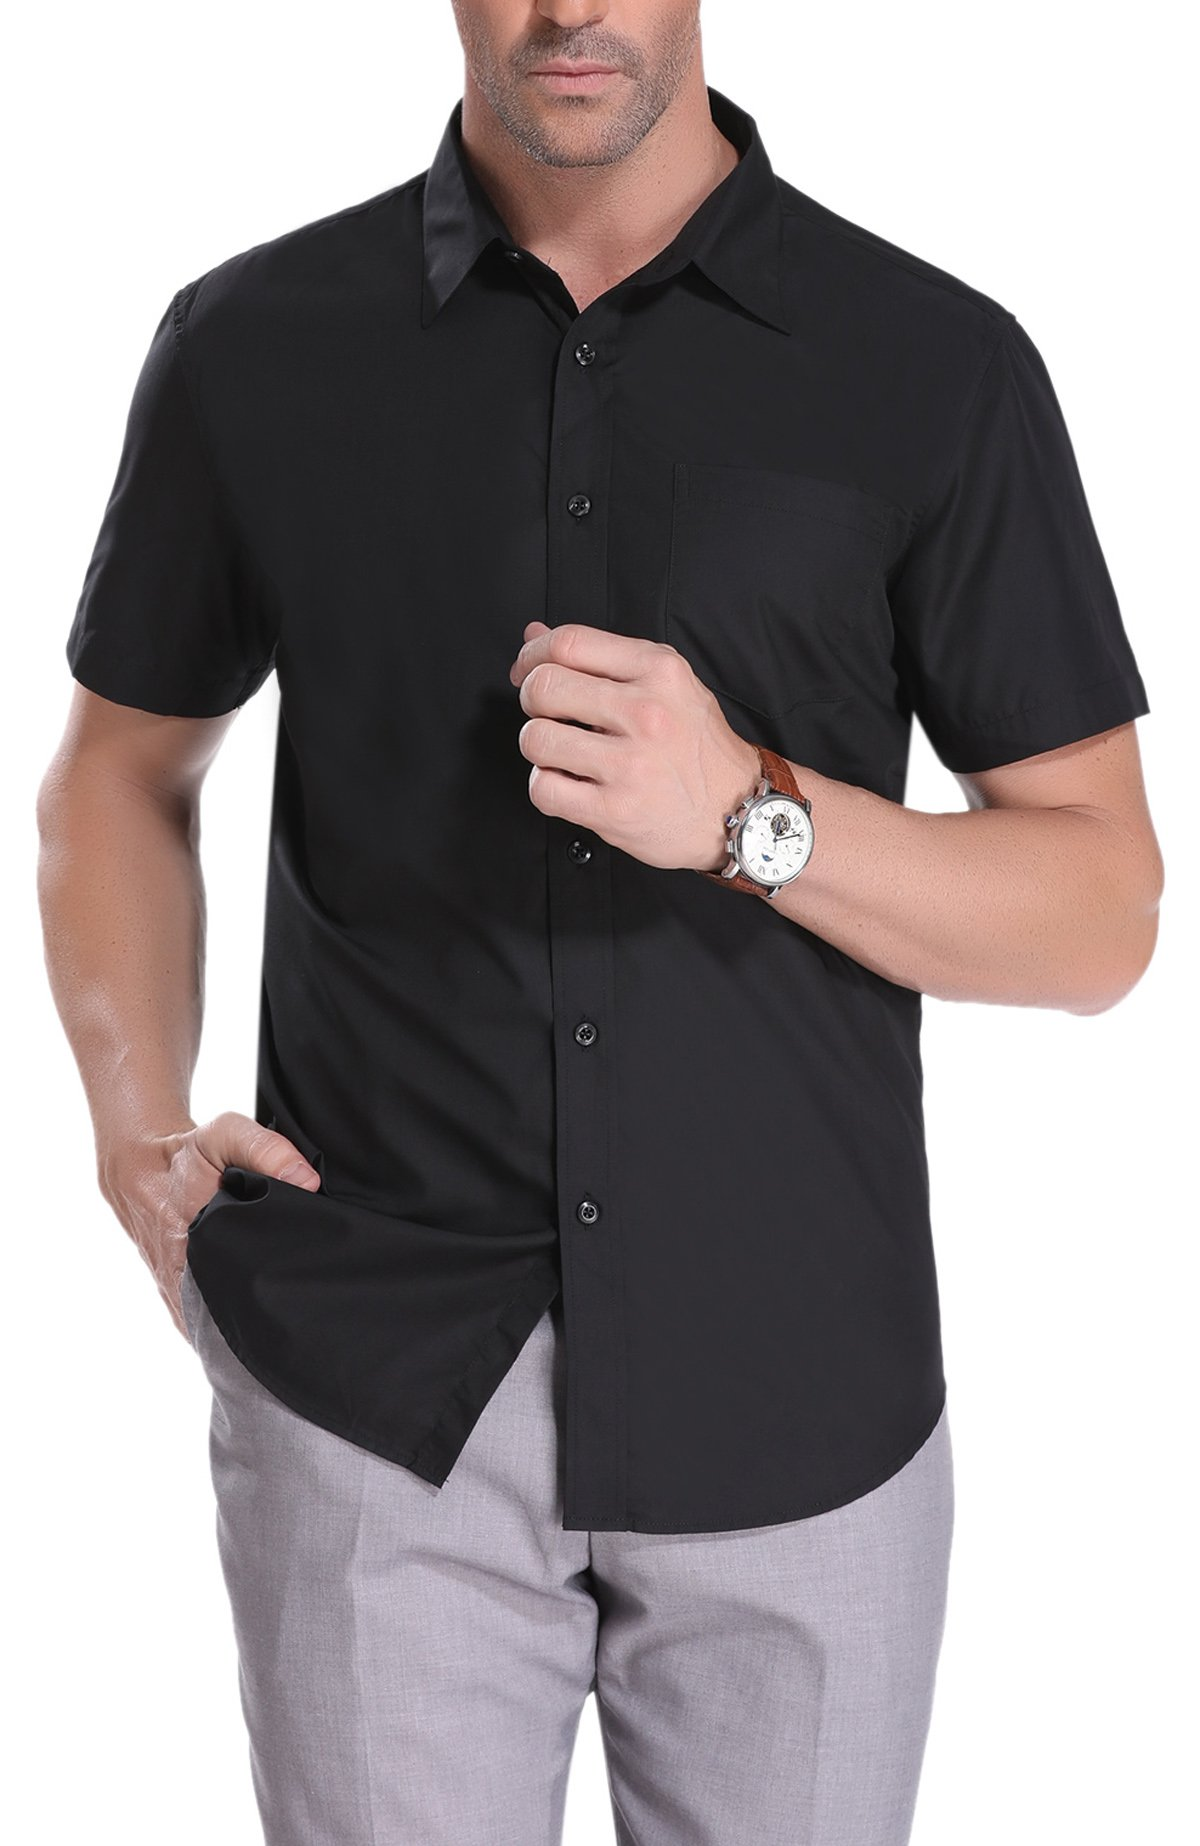 iClosam Men's Casual Short Sleeve Long Sleeve Button Down Shirt Collar Dress Shirt (Black, XX-Large) by iClosam